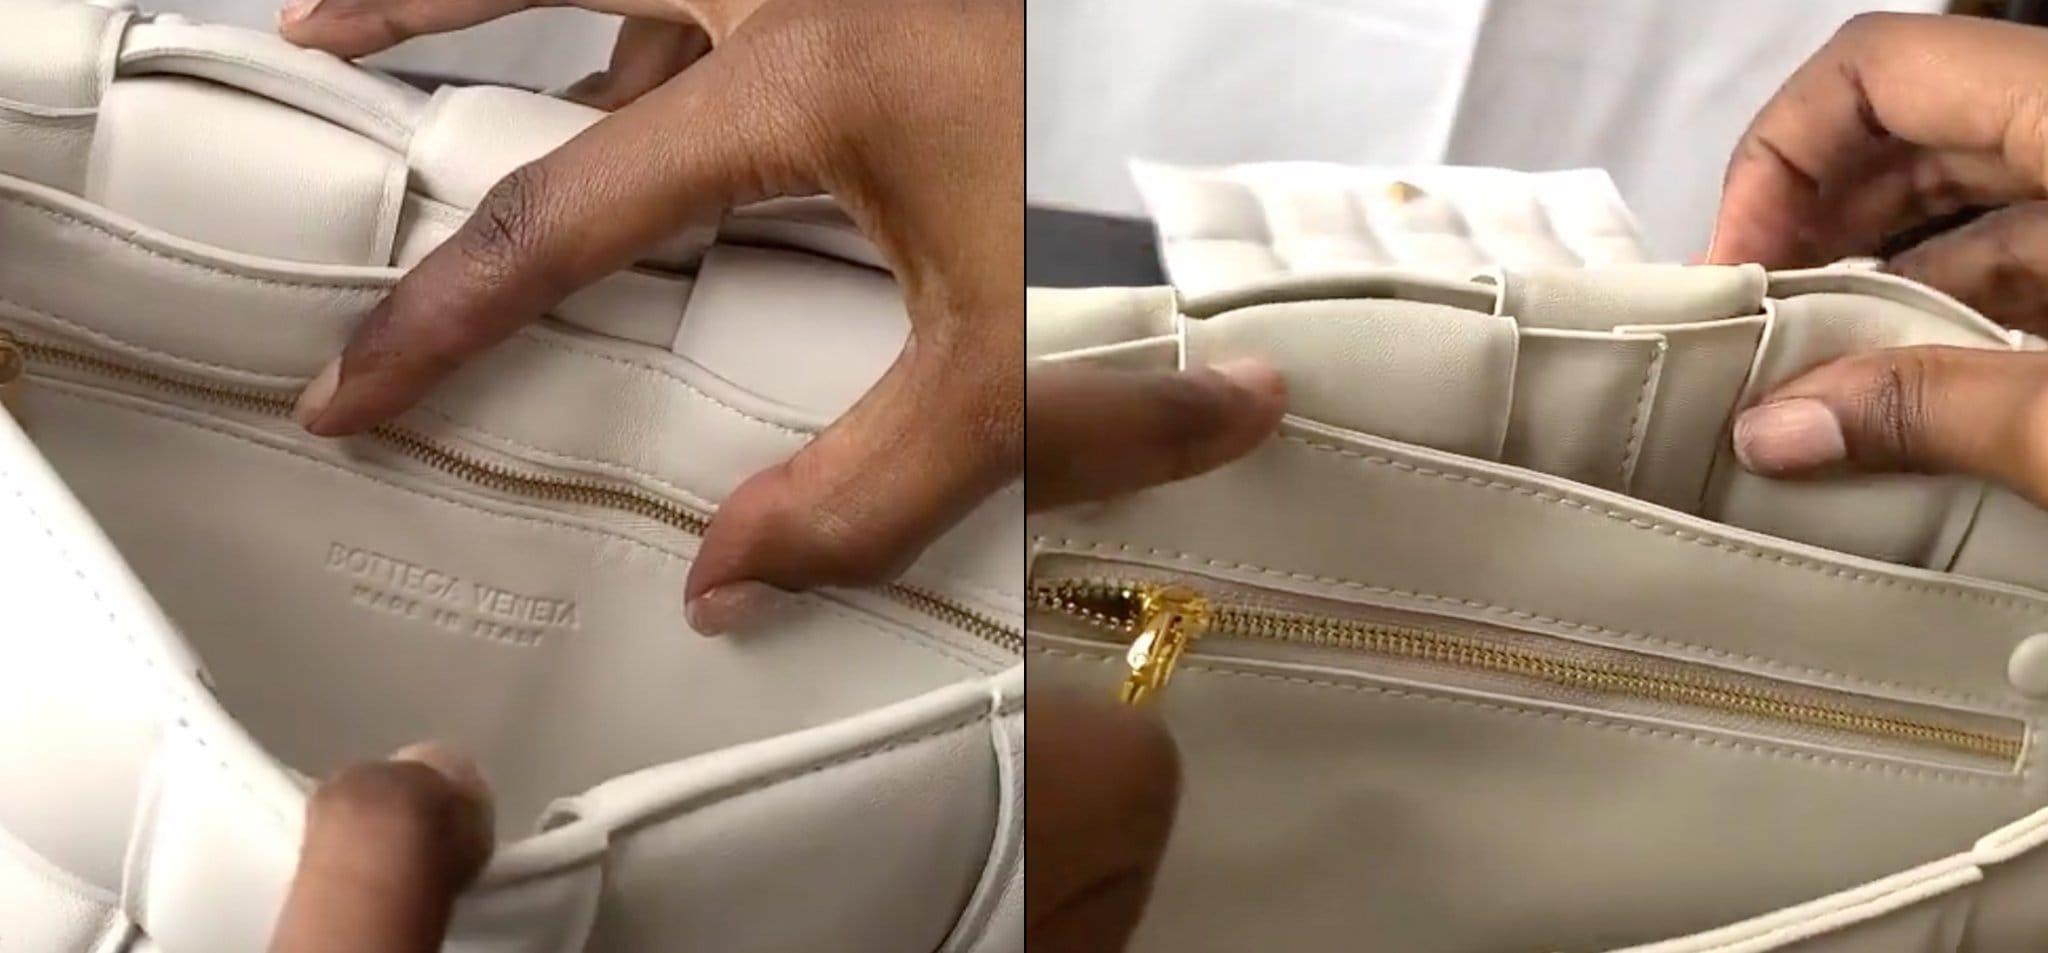 Real Bottega Veneta bags have an interior brand stamp that says Bottega Veneta Made in Italy, which is usually missing on fake Bottega Veneta bags